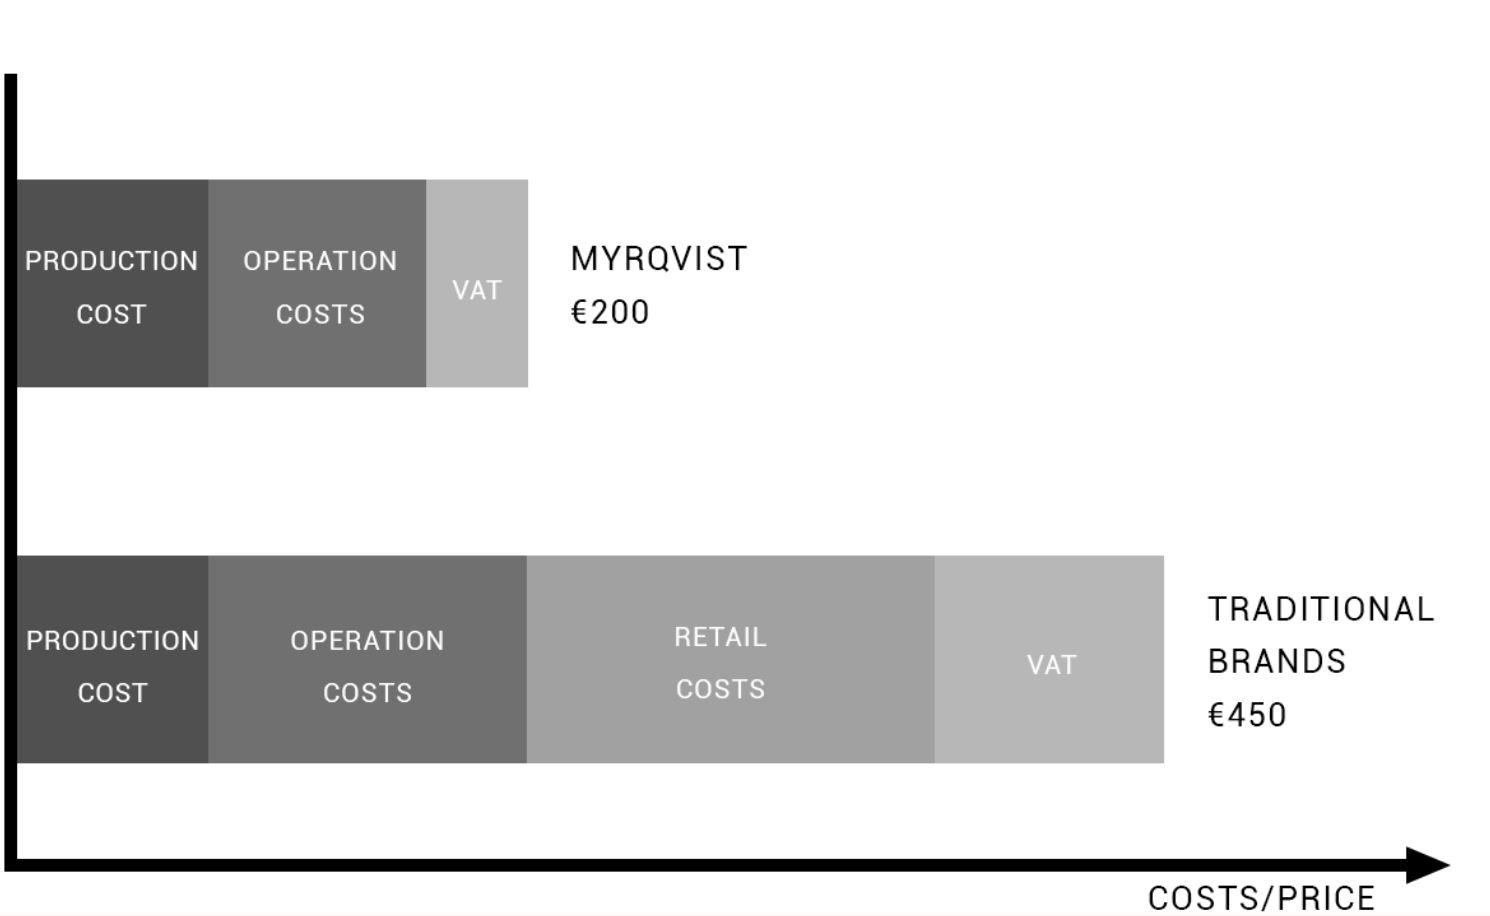 myrqvist review - business model